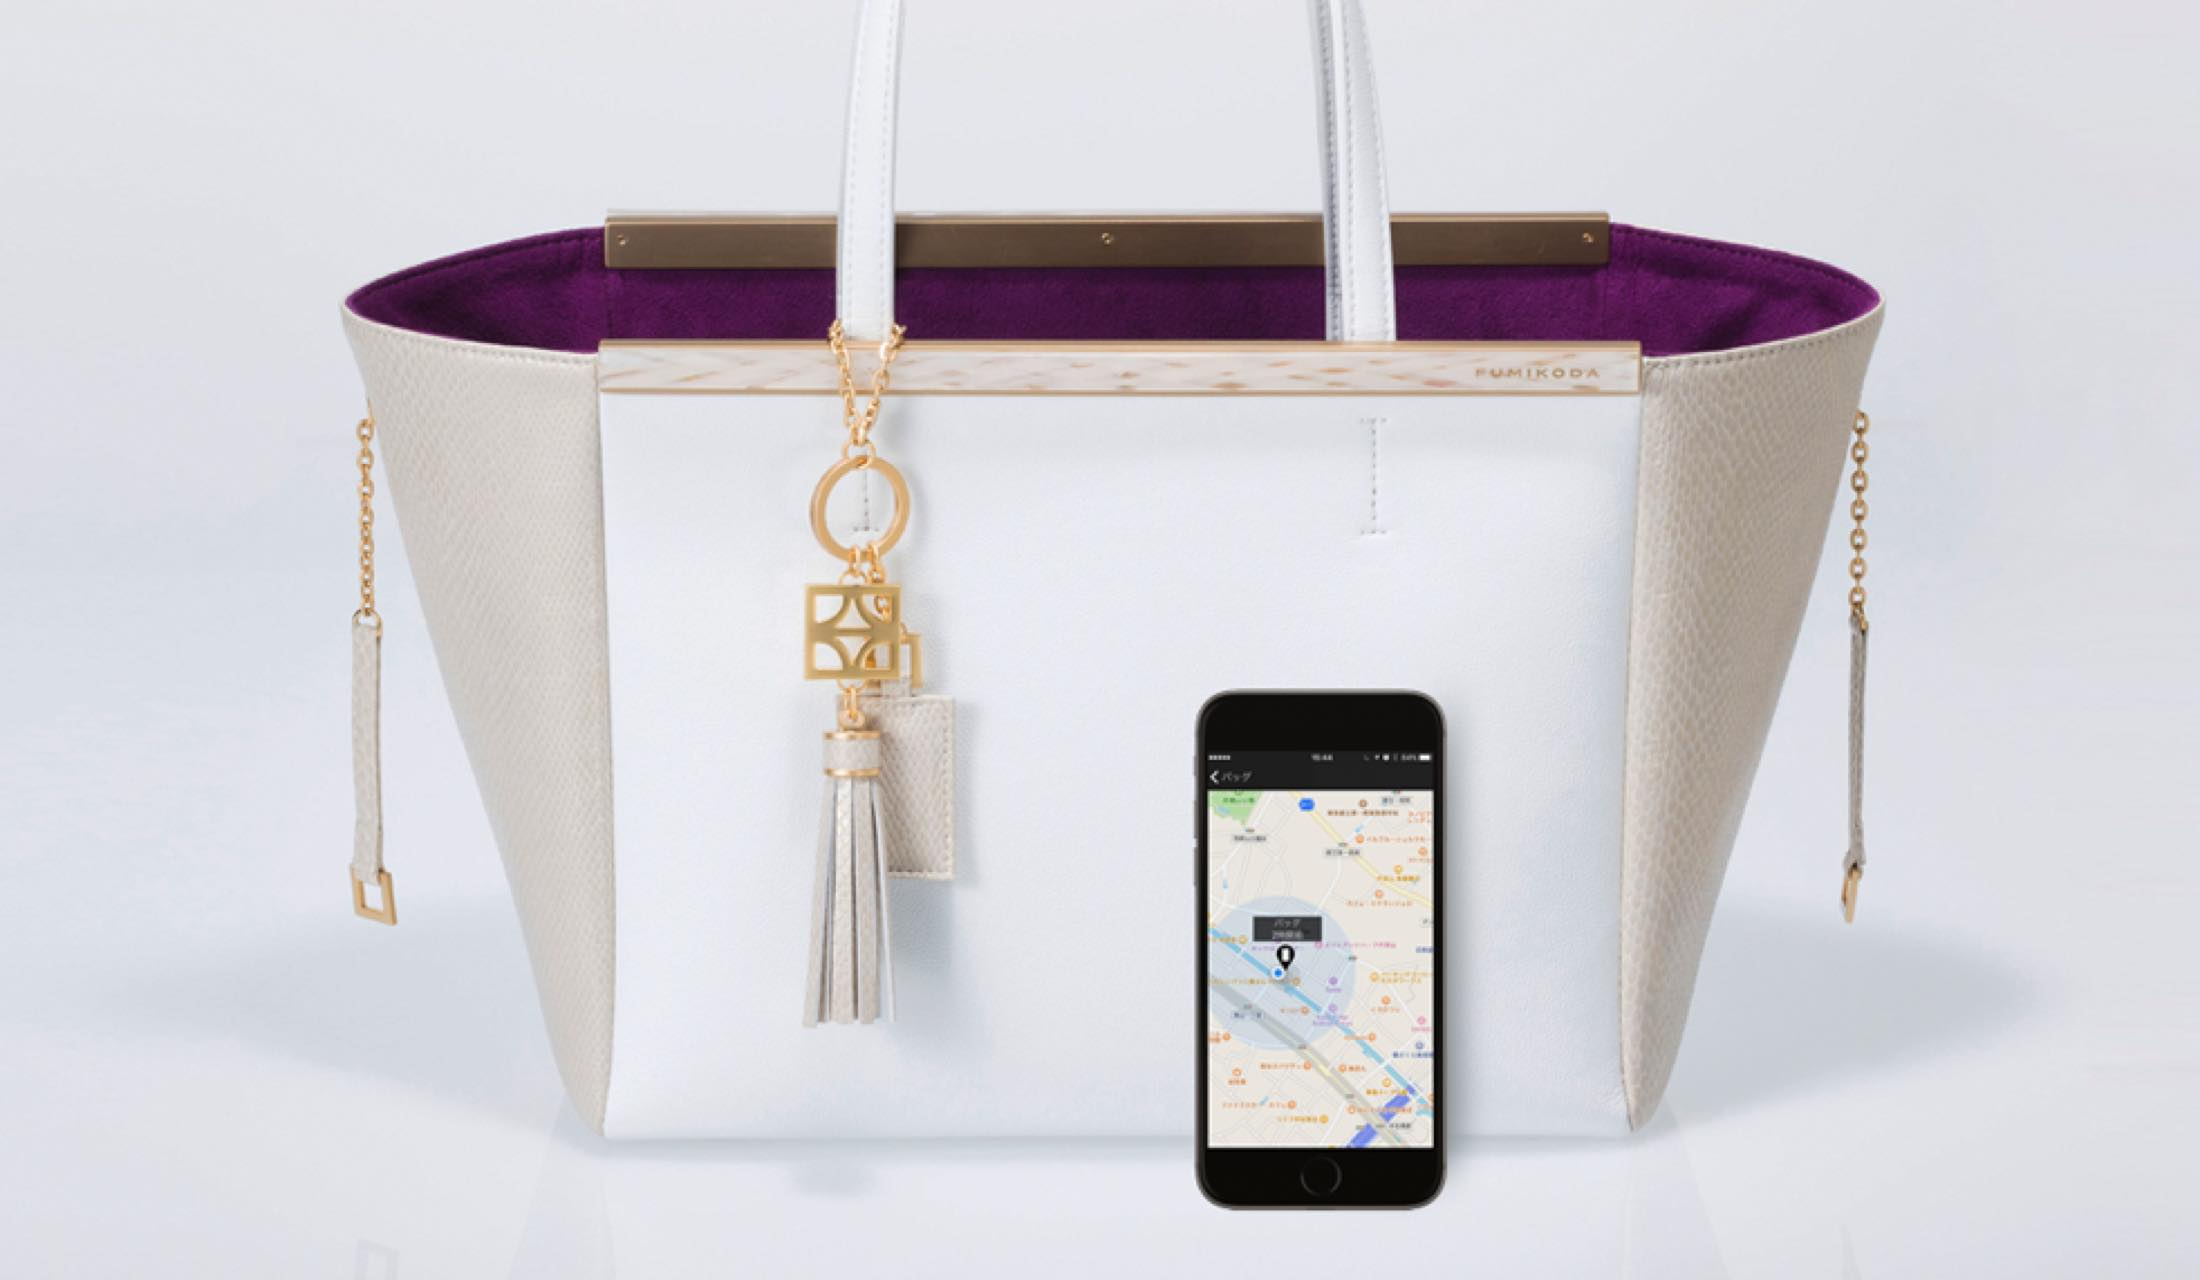 FUMIKODAのバッグ、キーチャームとスマートフォン